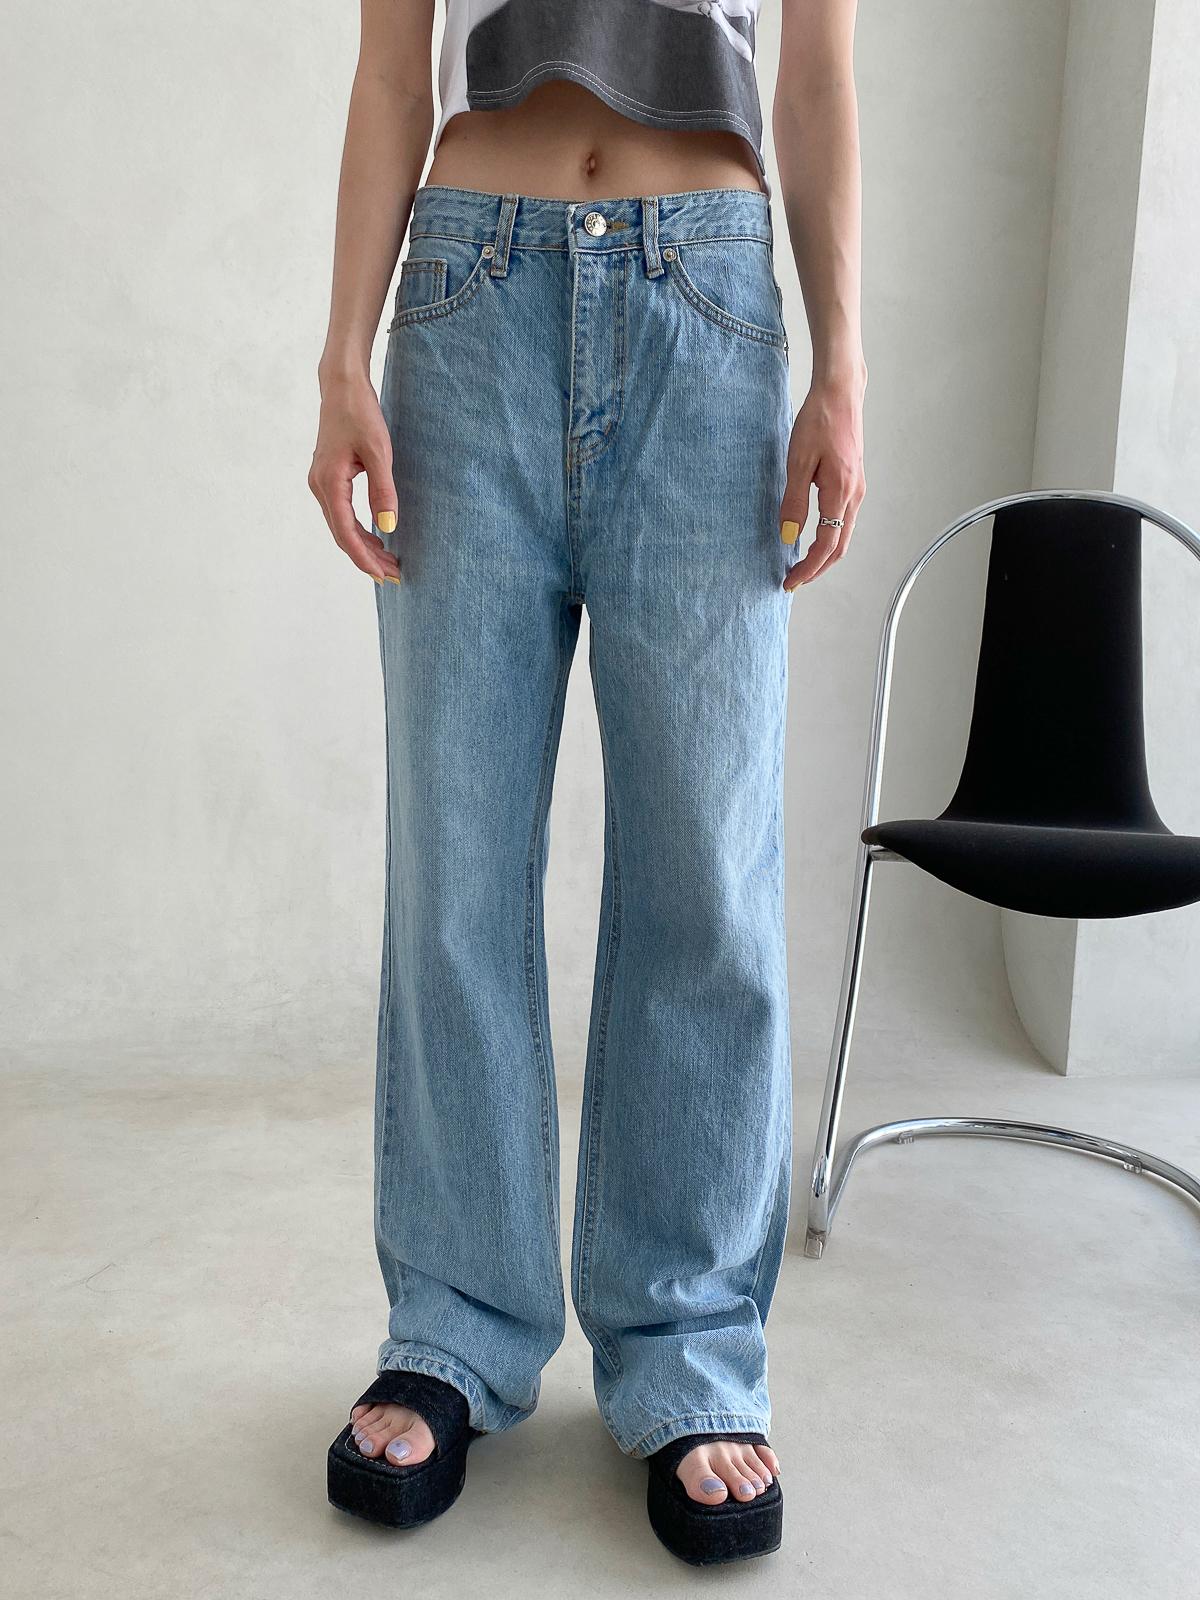 no.7039 ribs Light Blue pants